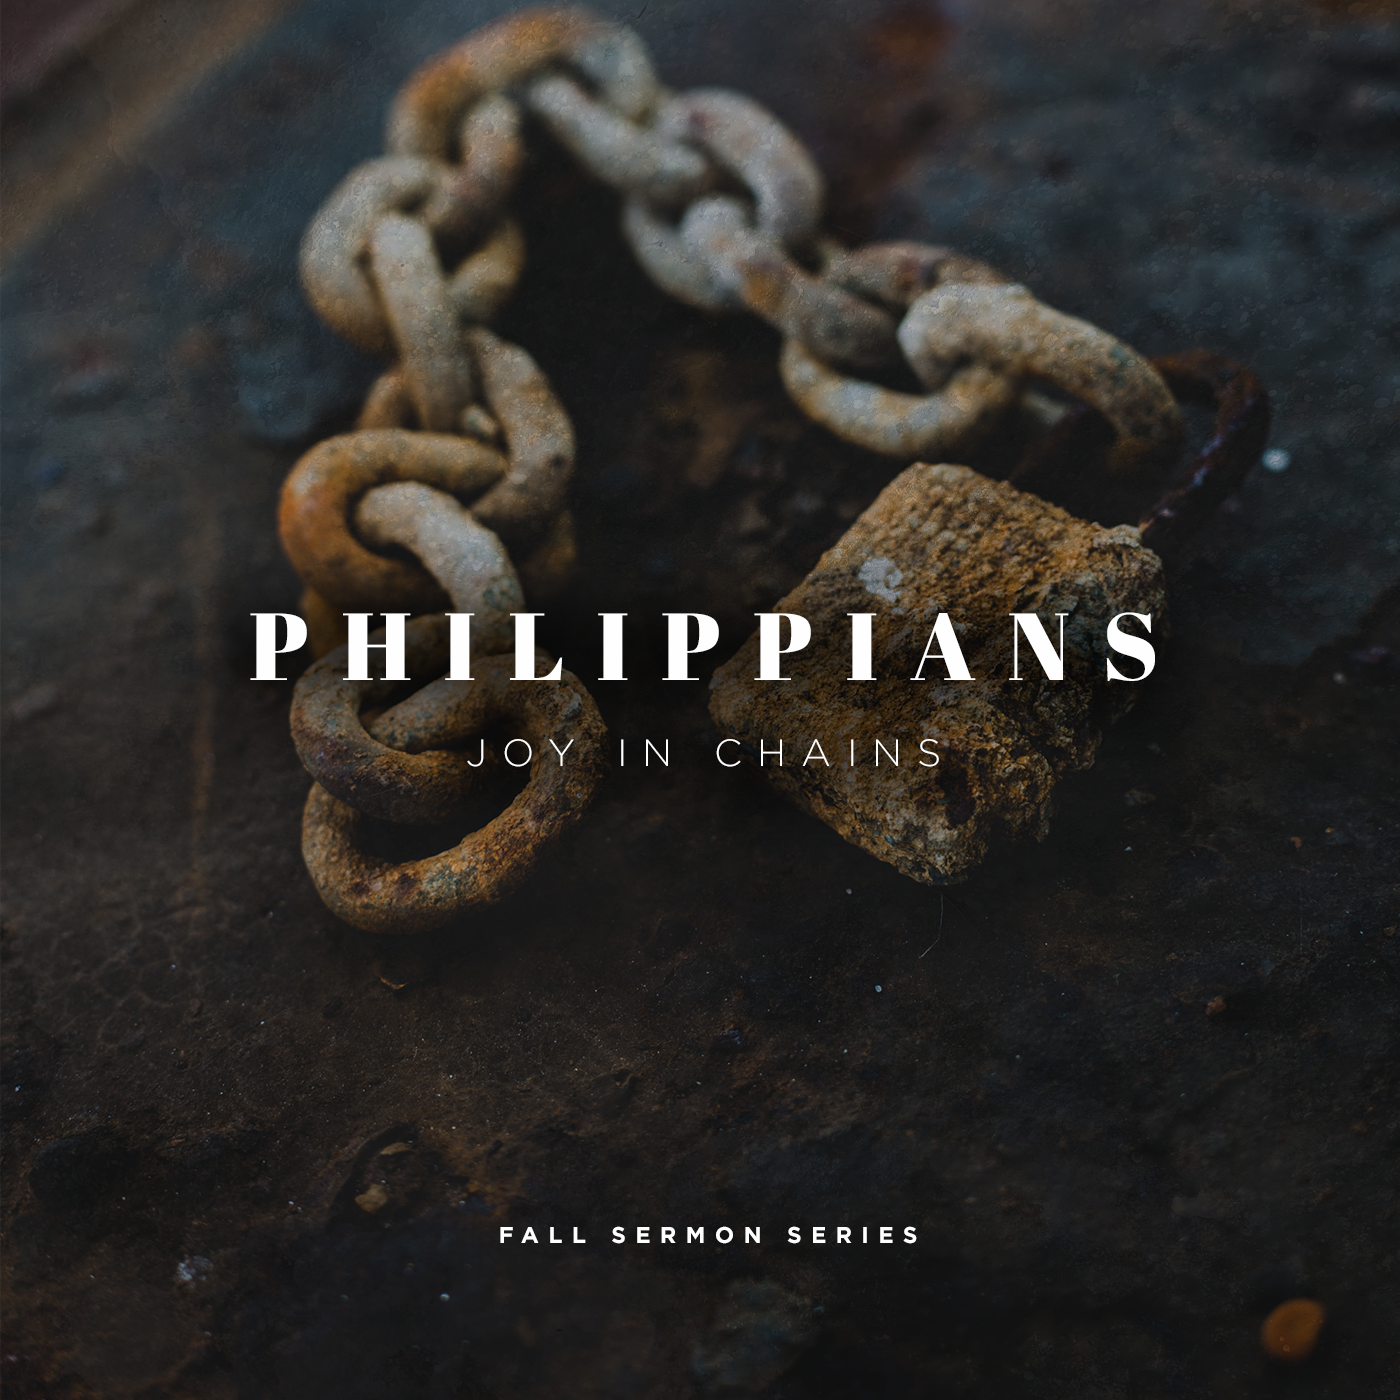 Sermon Series on the book of Philippians at Rockwall Presbyterian Church.